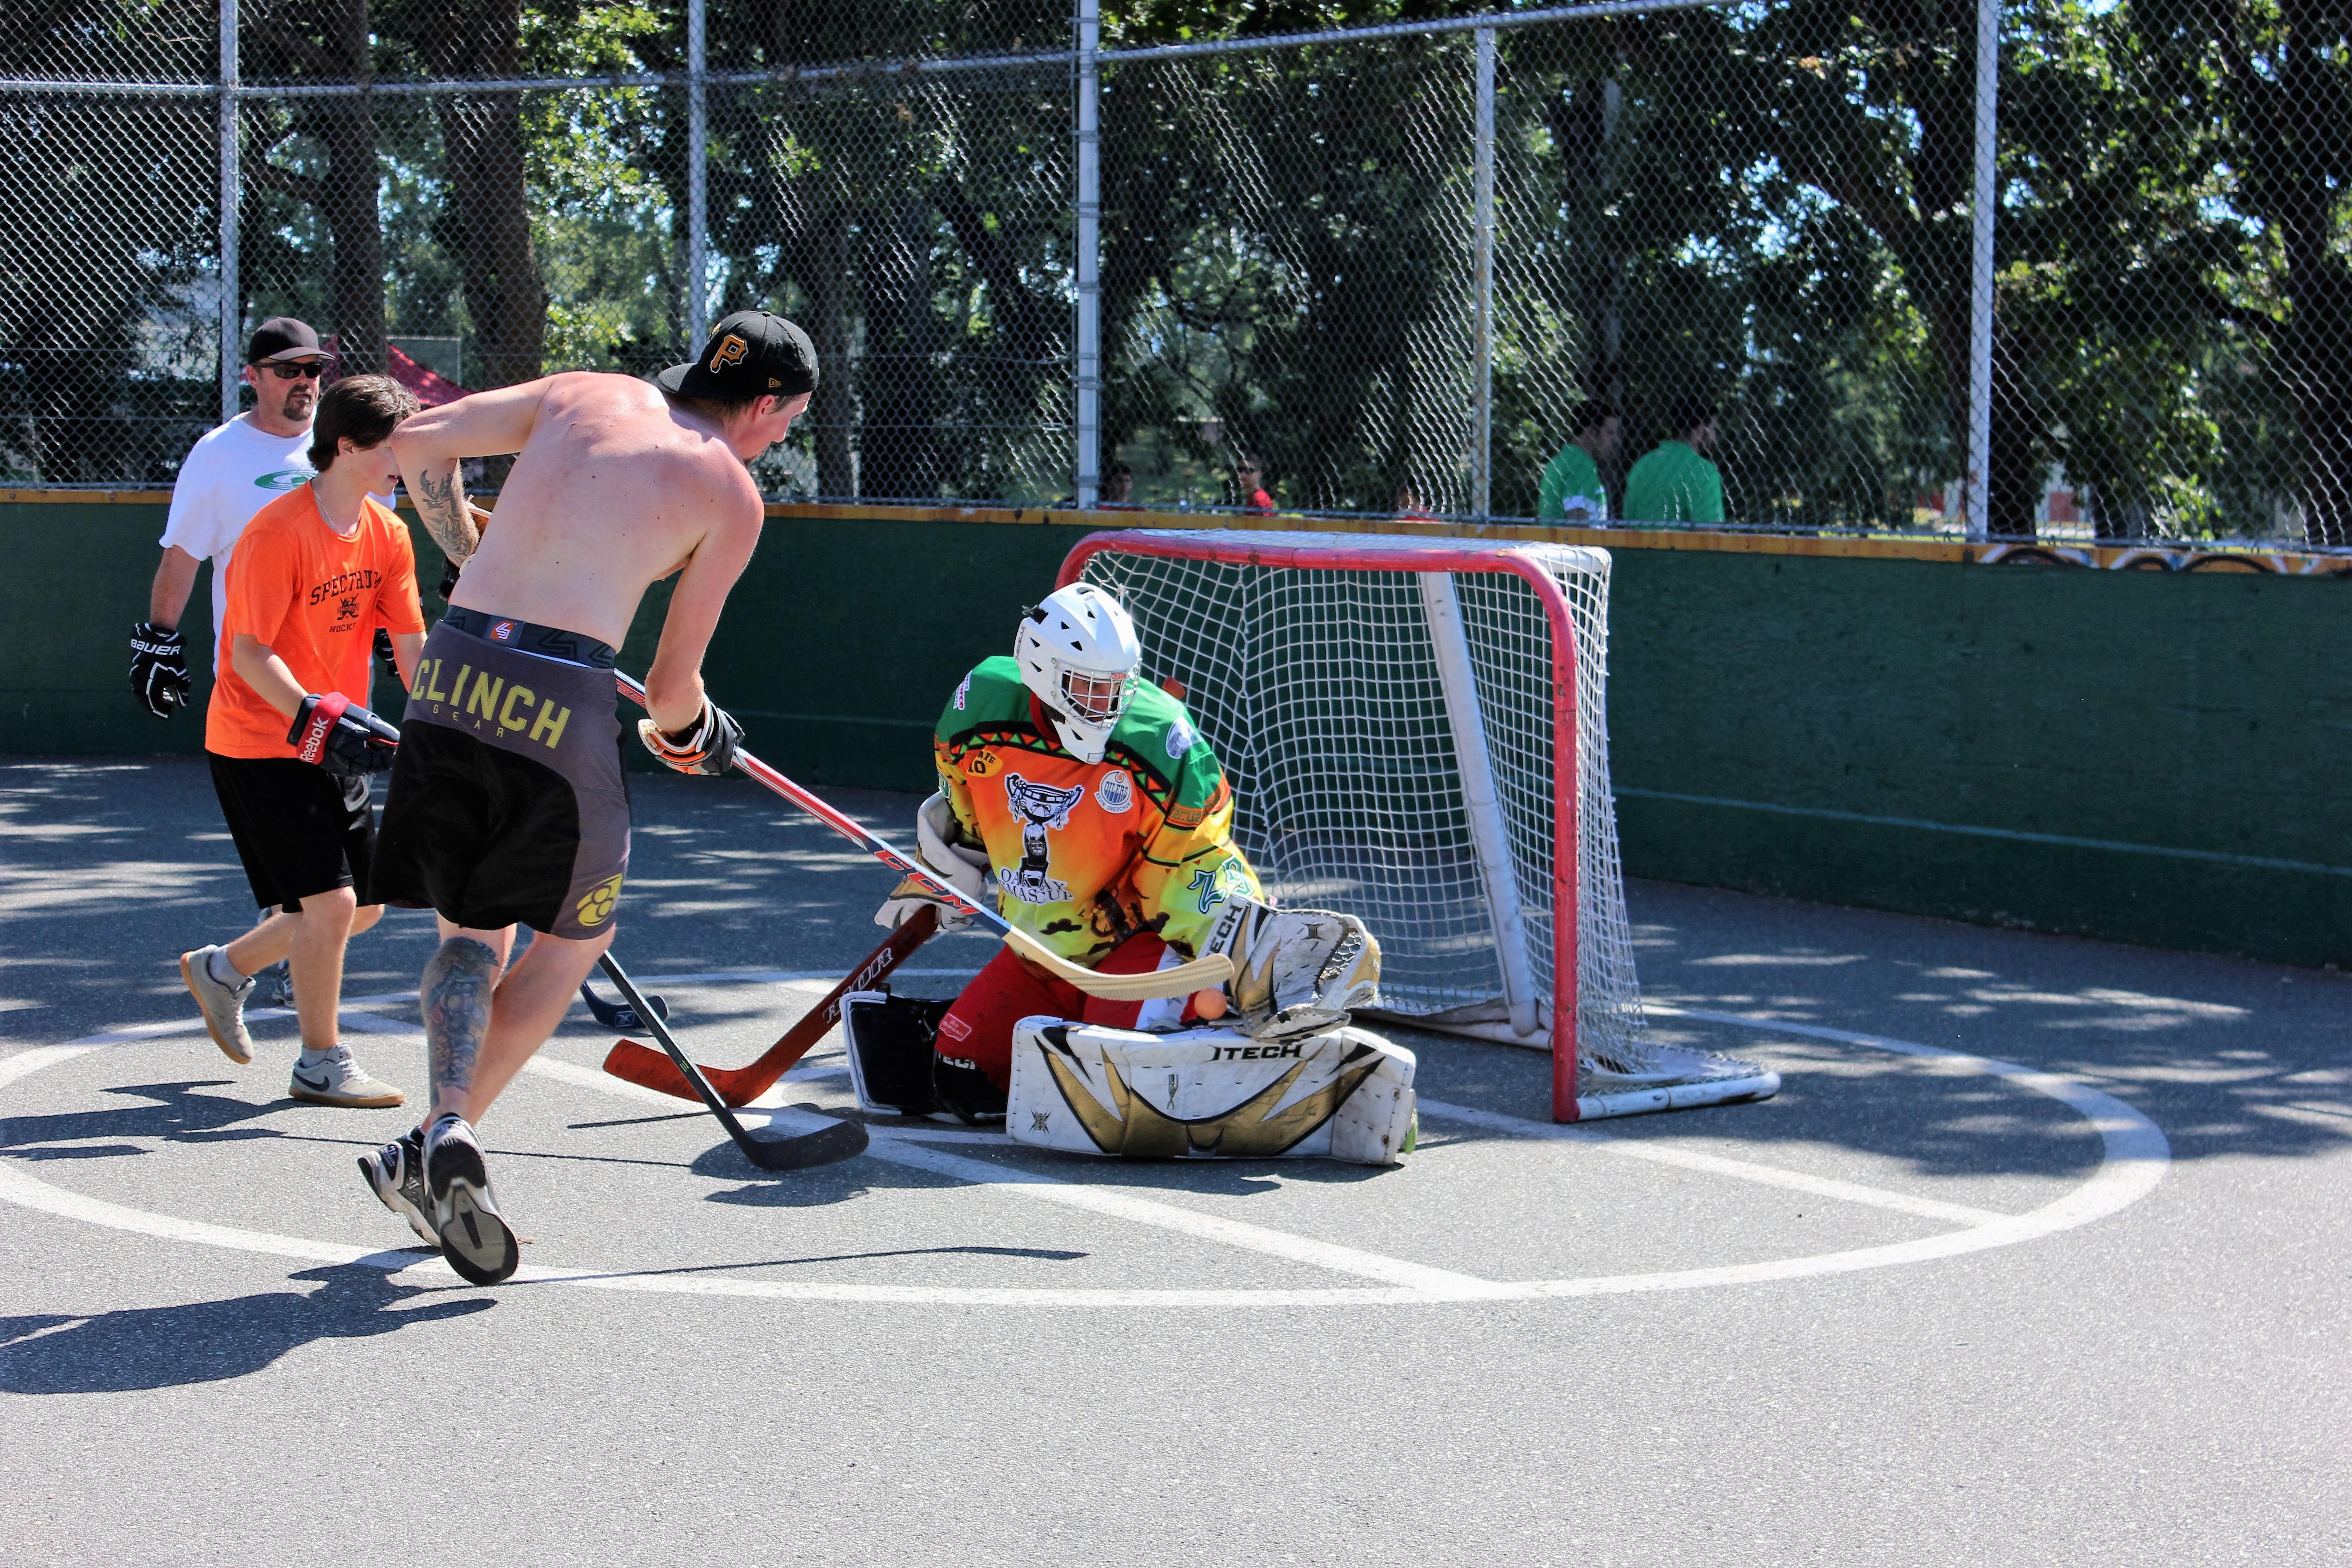 ISG 2016 - Street Hockey